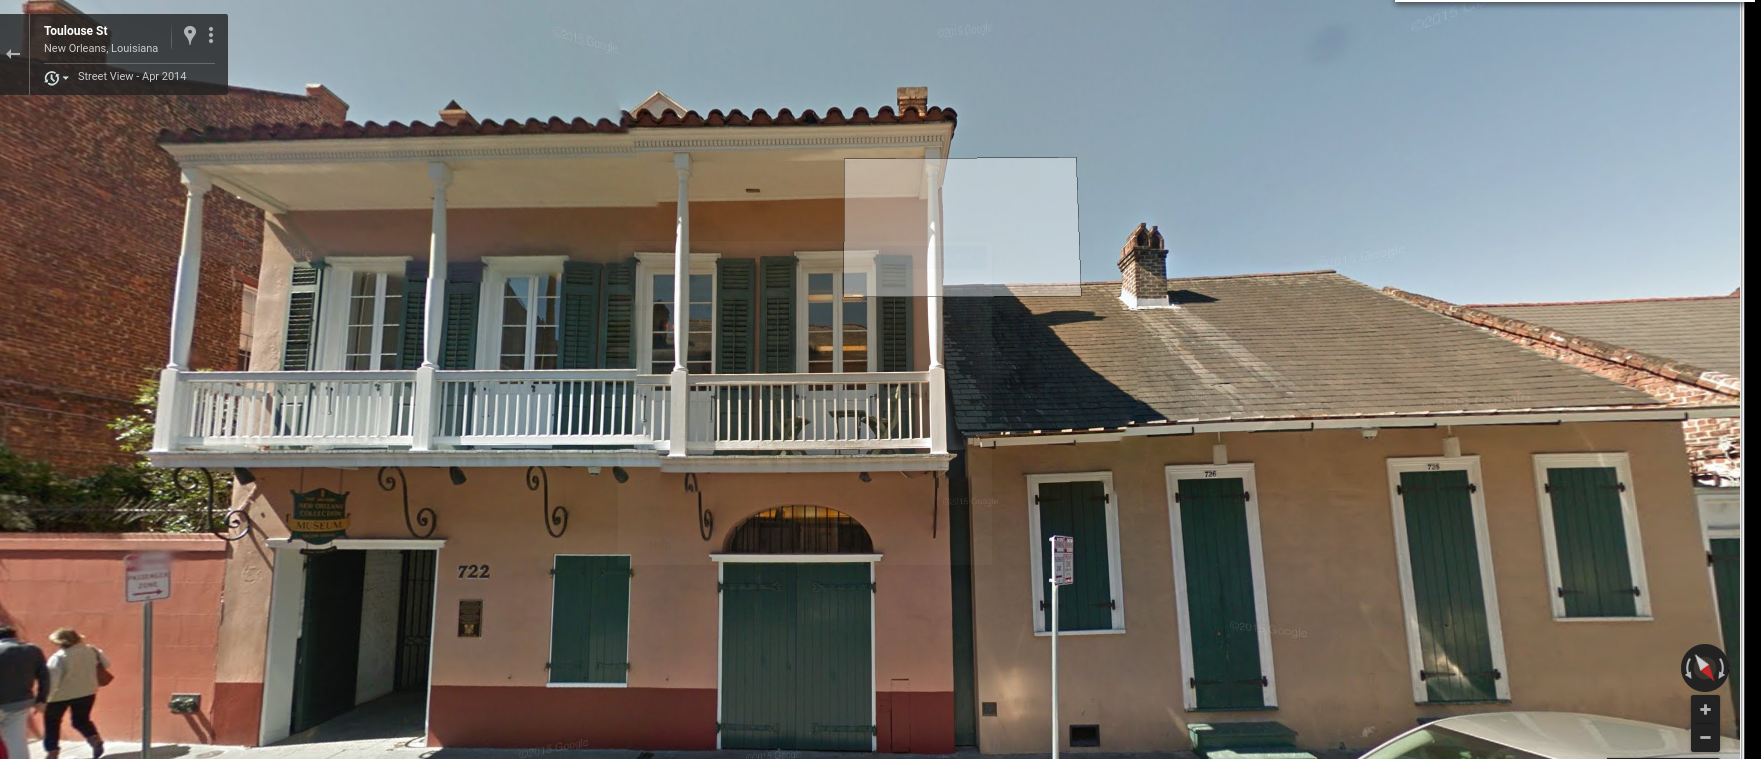 722 Toulouse Street